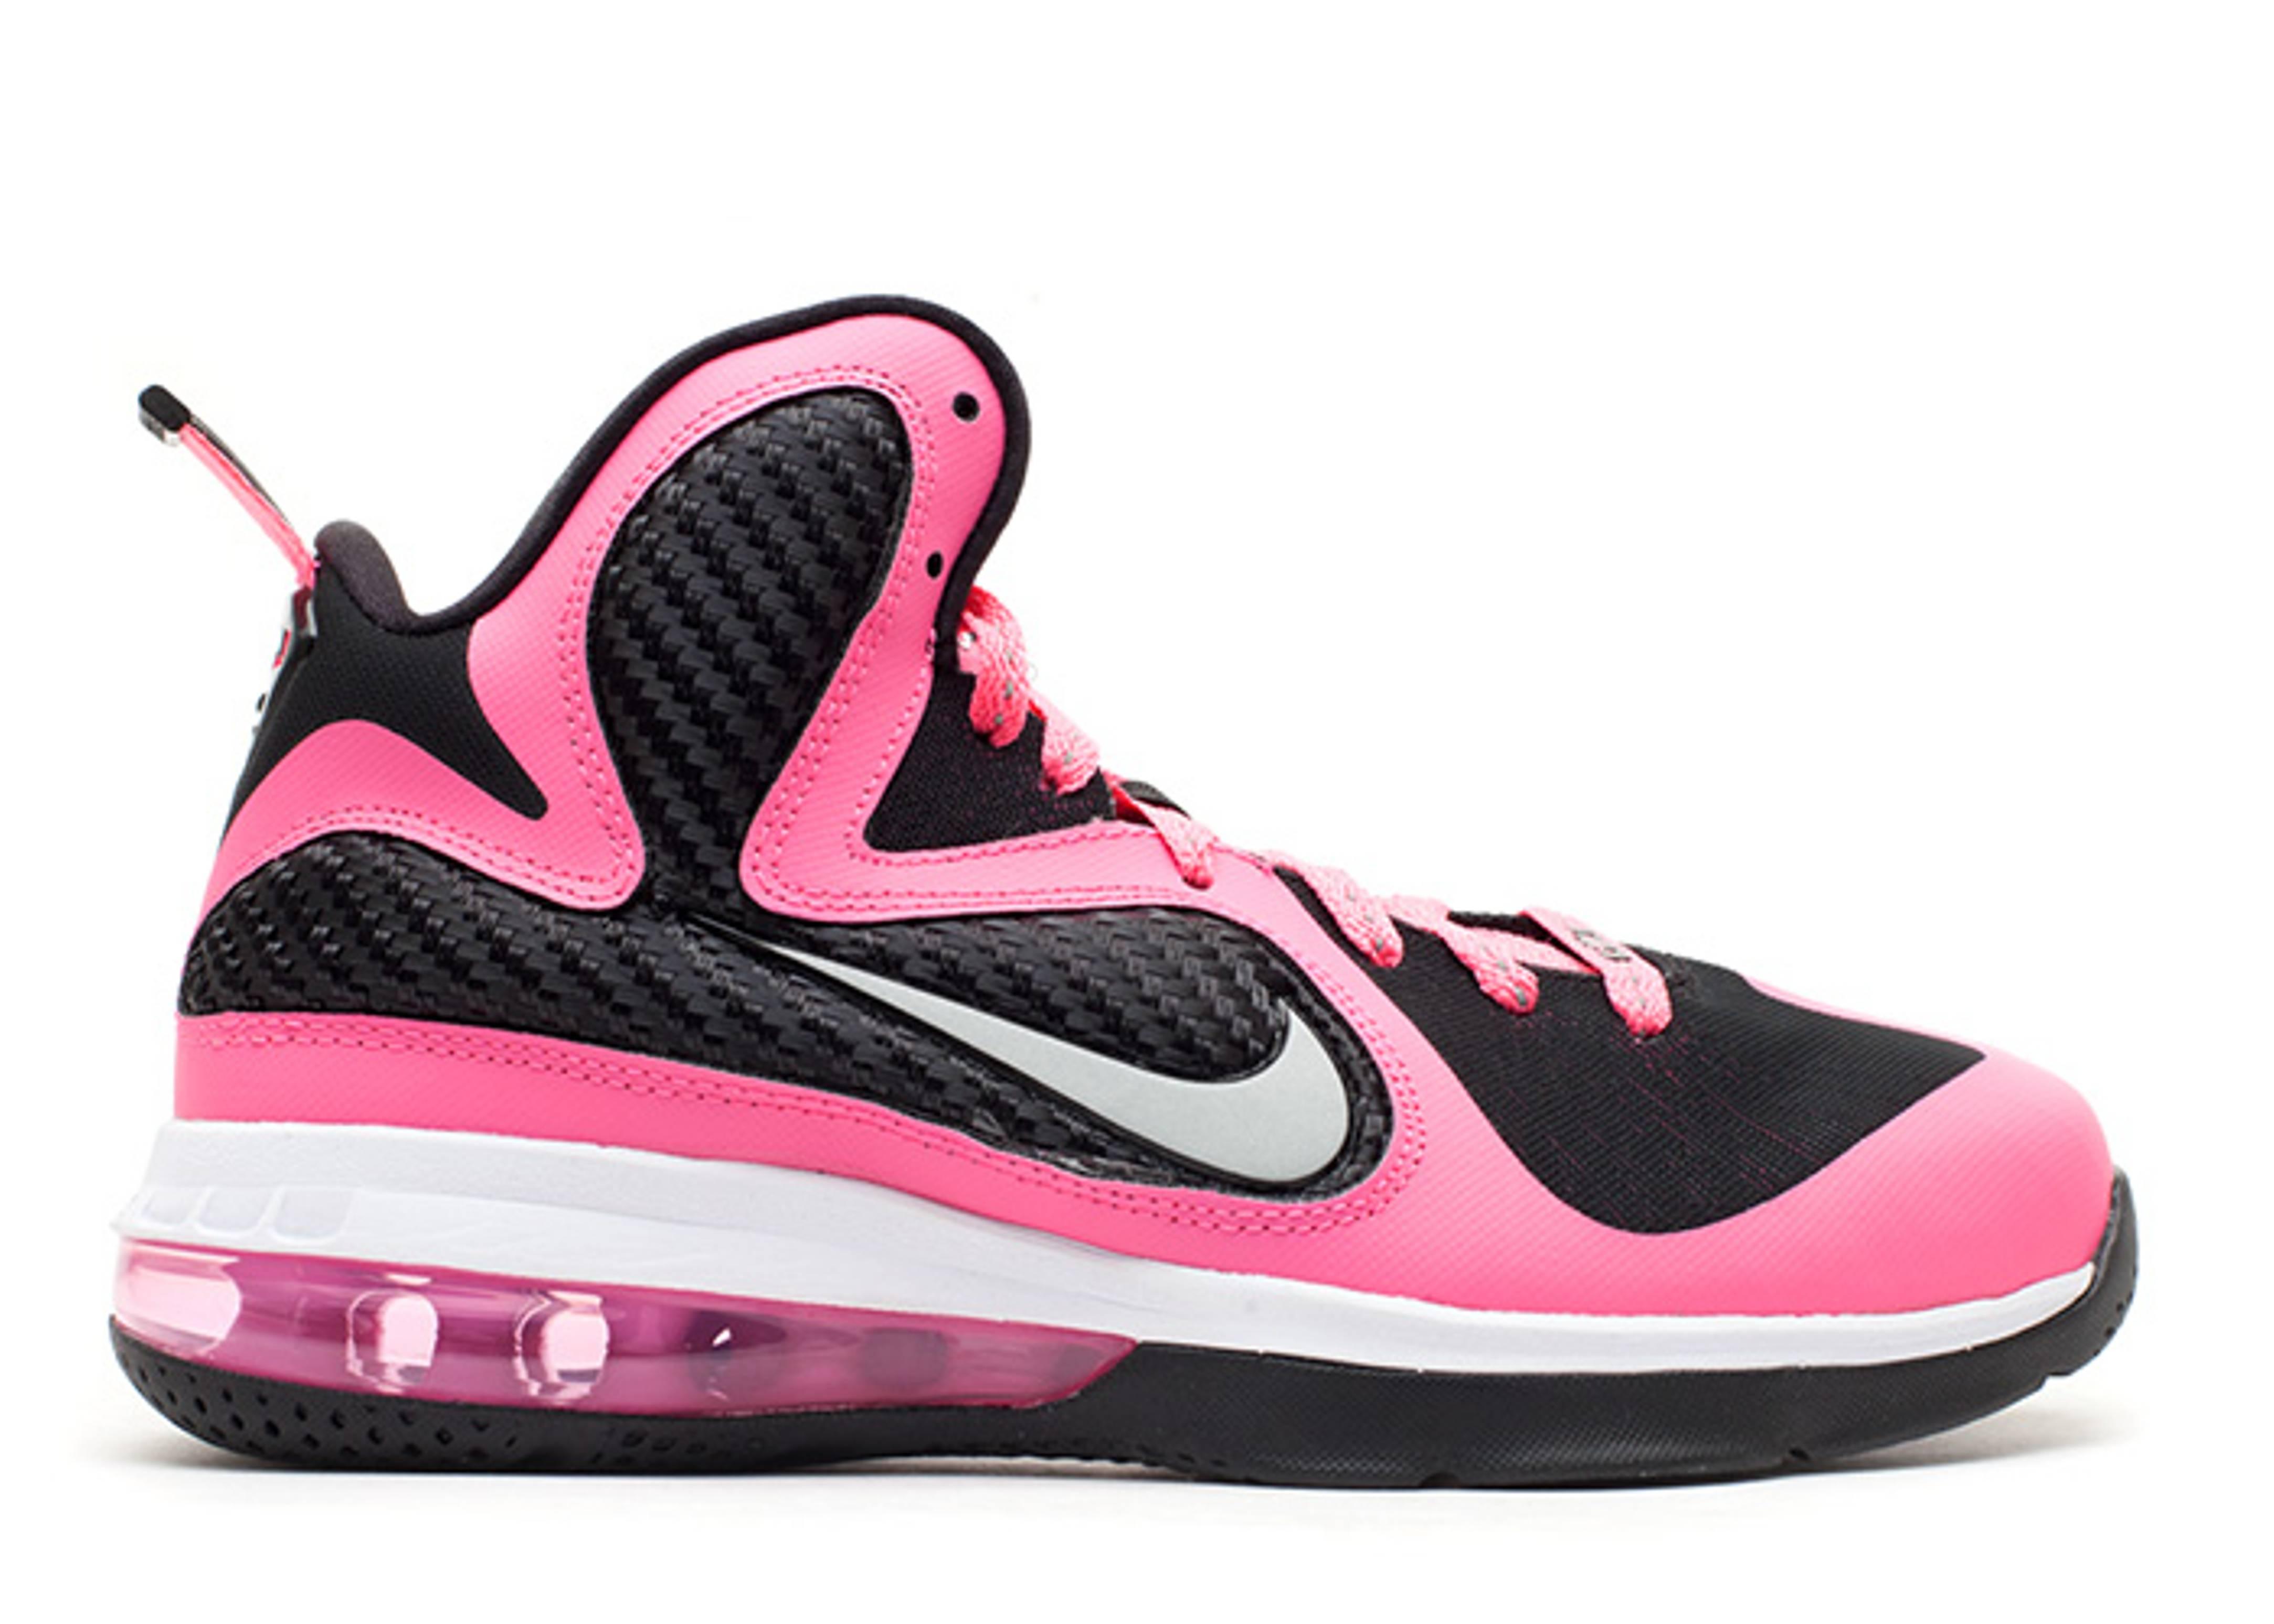 huge discount 8f76e de969 Lebron 9 (gs) - Nike - 472664 600 - laser pink metallic silver-blk ...